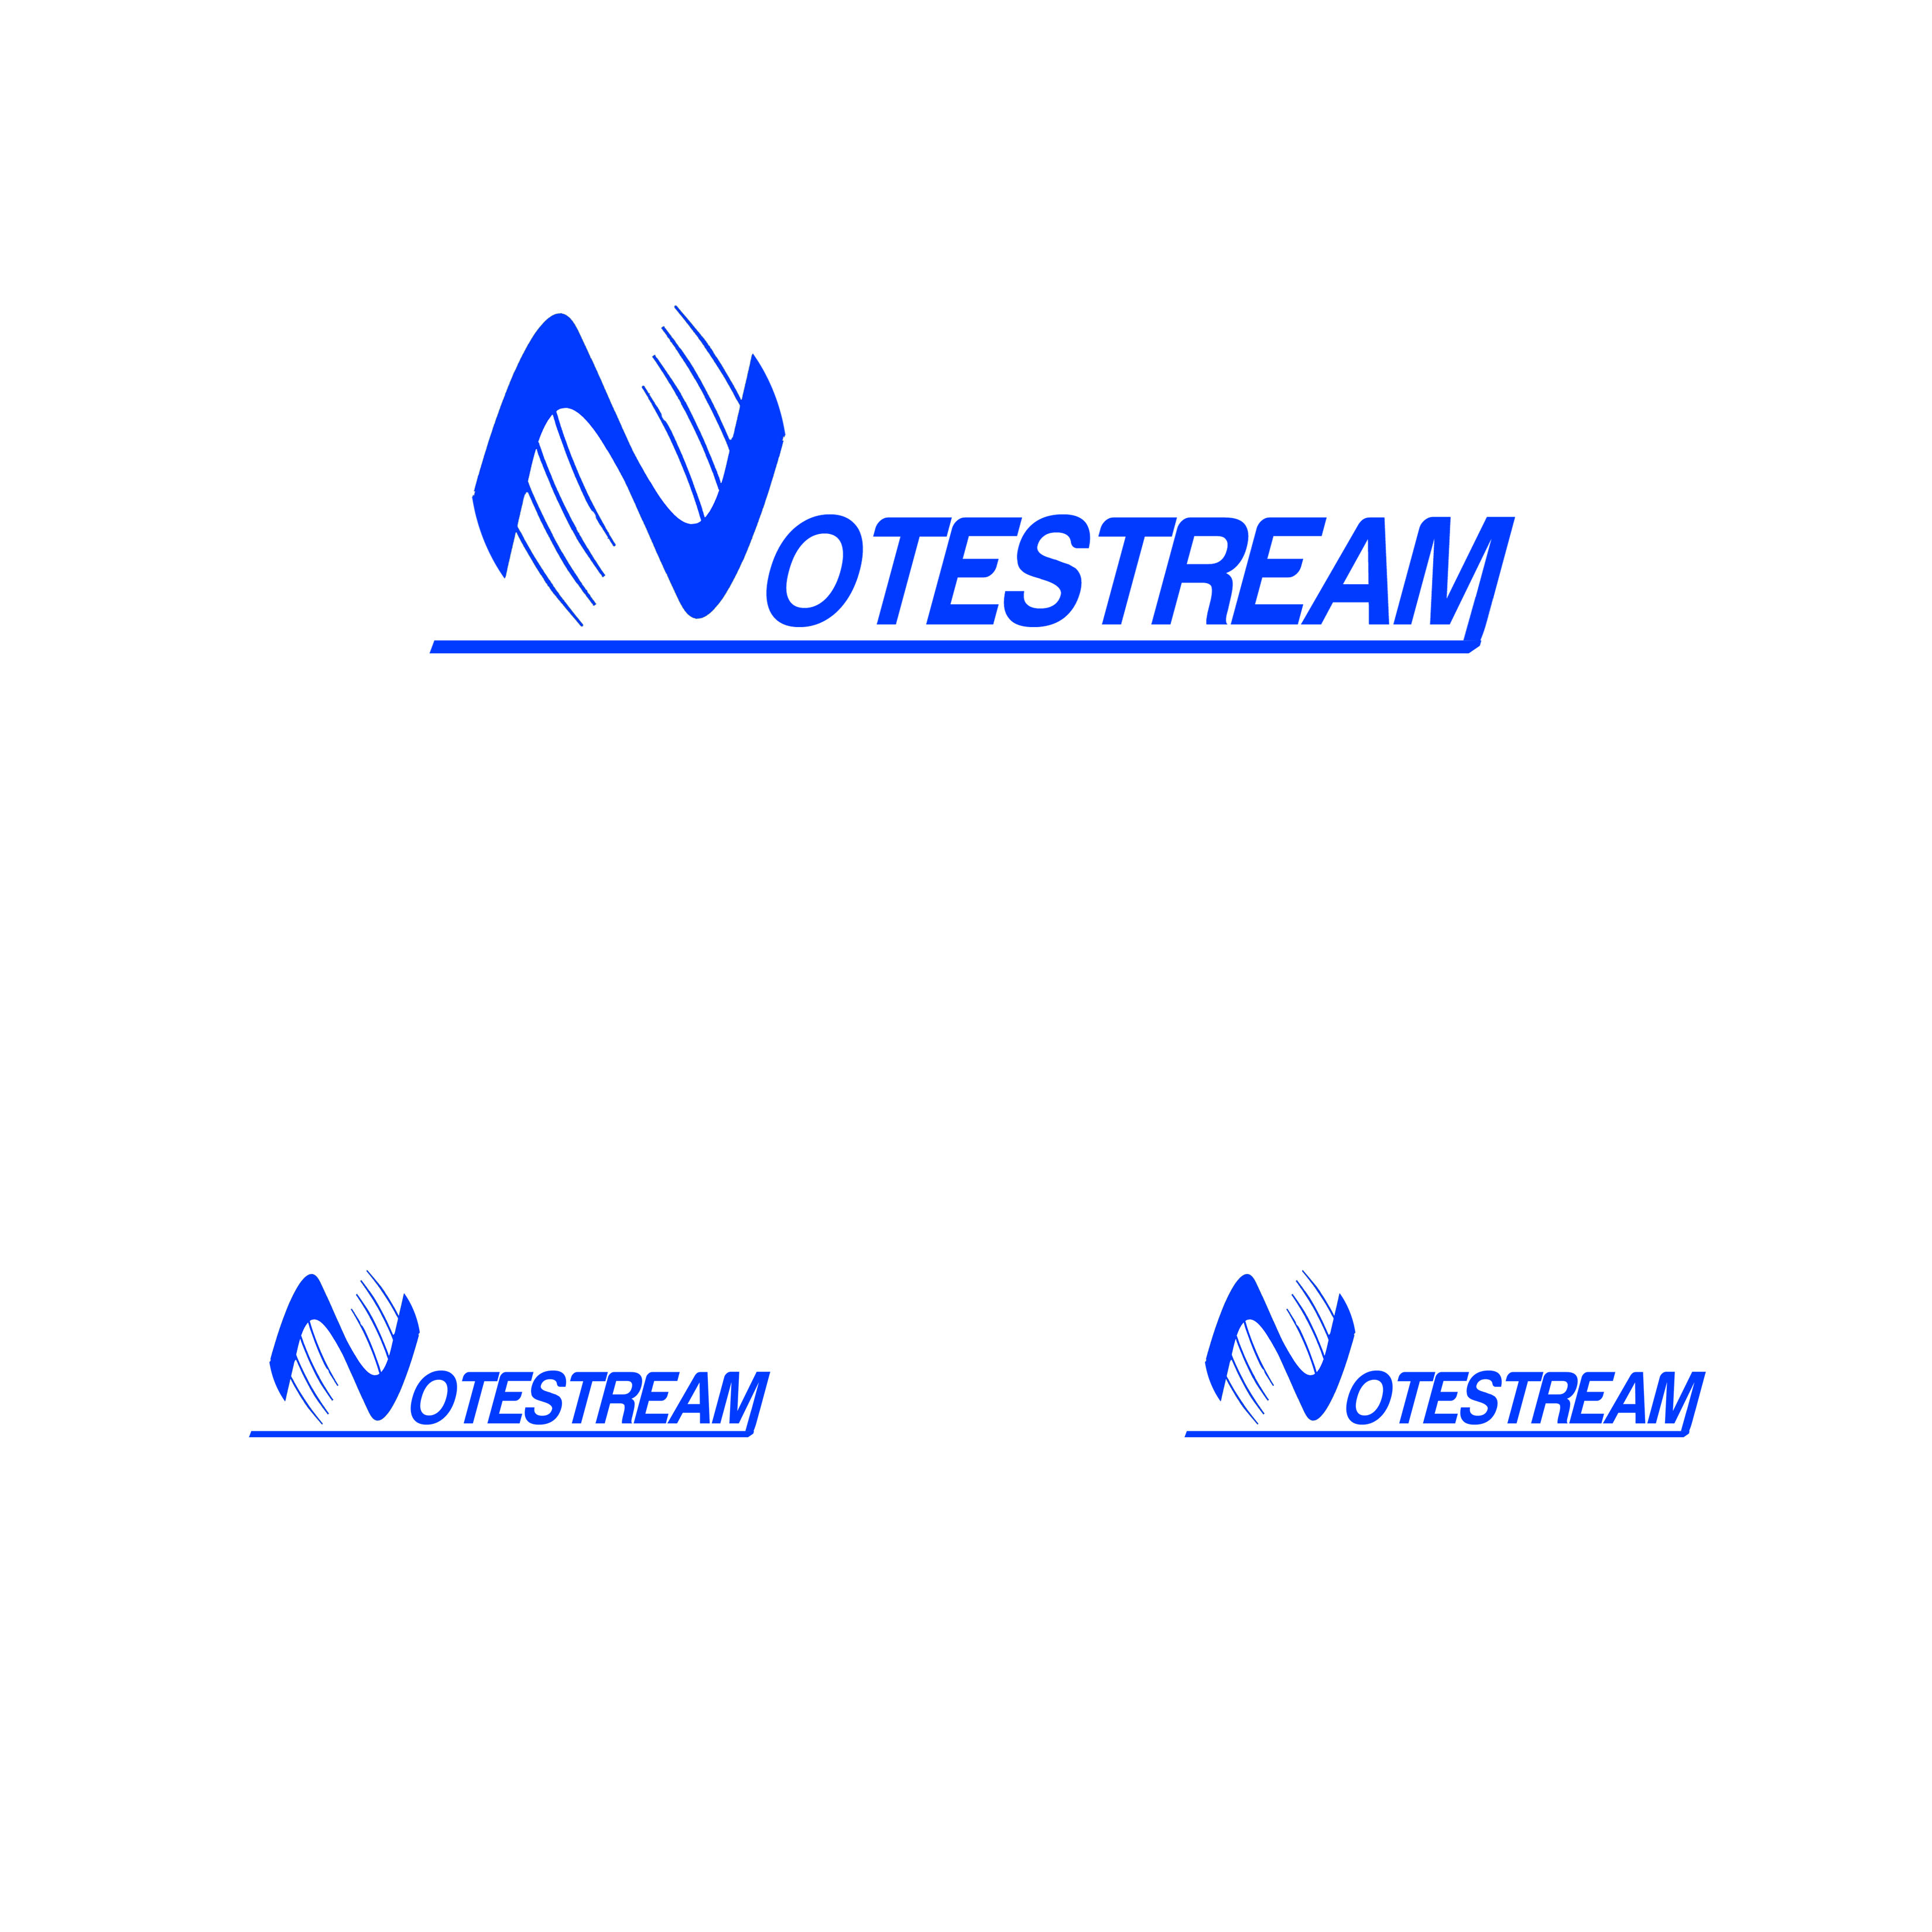 Logo Design by Alan Esclamado - Entry No. 54 in the Logo Design Contest Imaginative Logo Design for NoteStream.